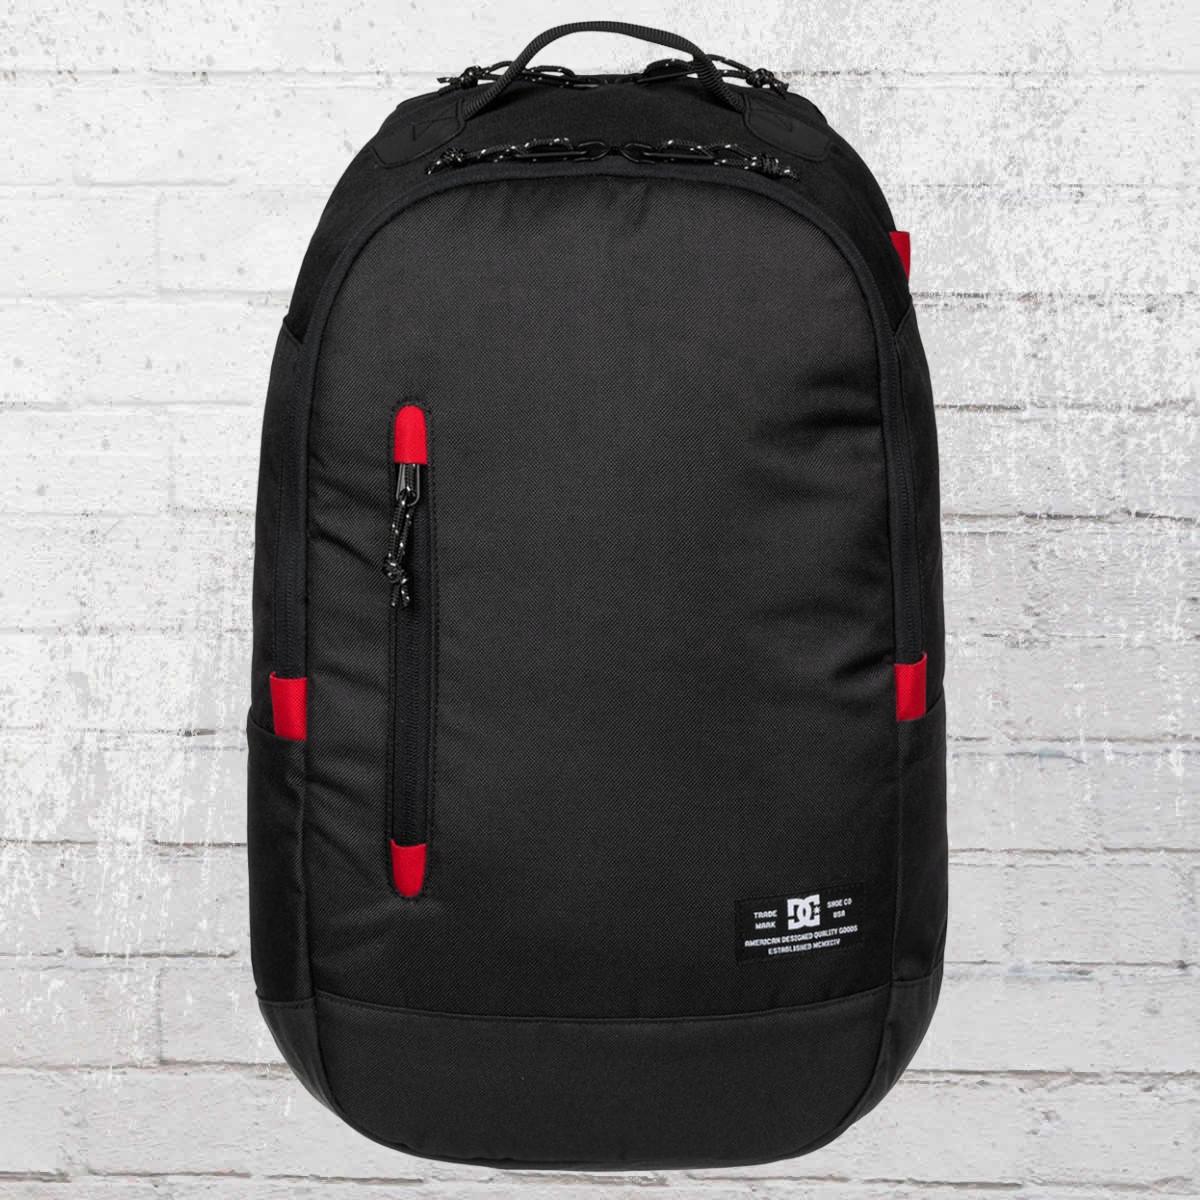 c3a374e3a0 Order now   DC Shoes Rucksack Trekker Laptop Backpack black